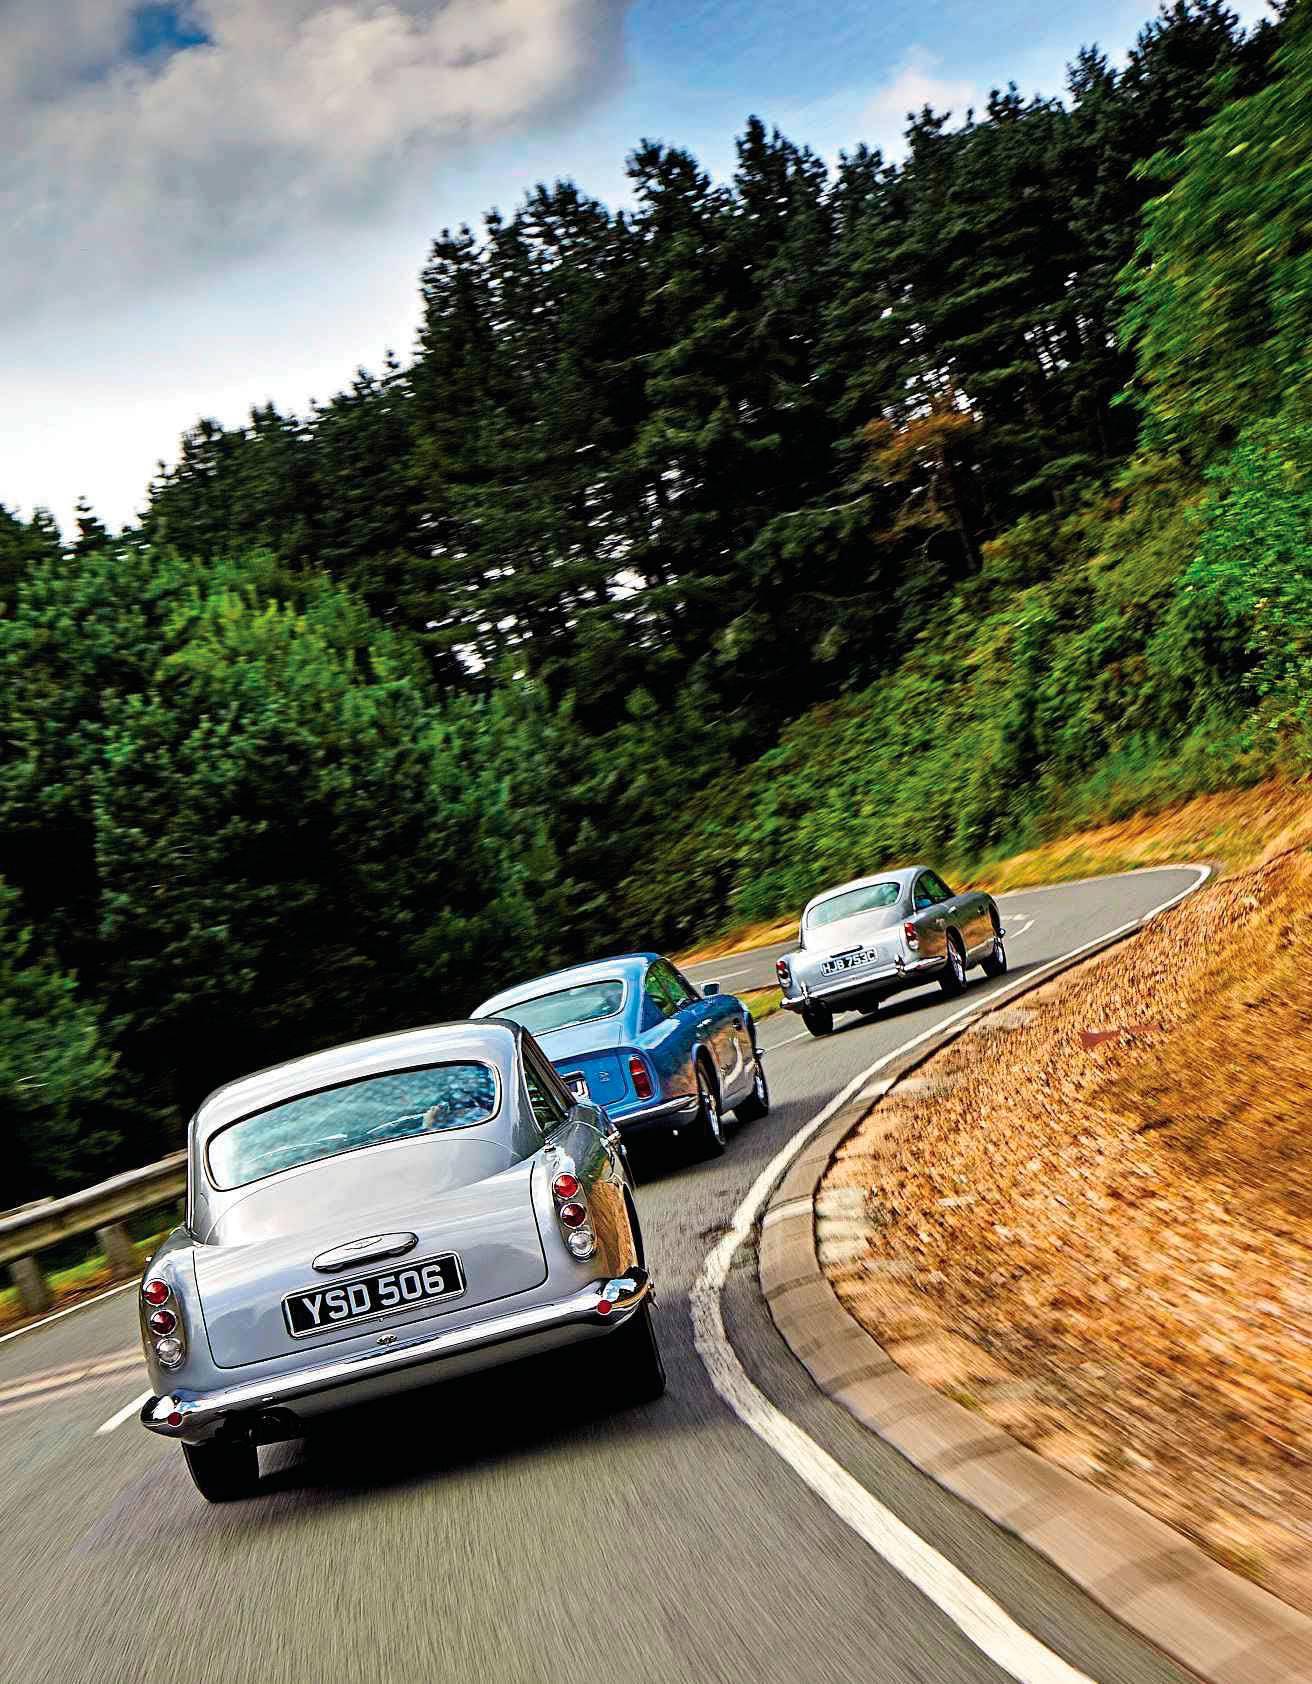 1958-1970 DB4 DB6